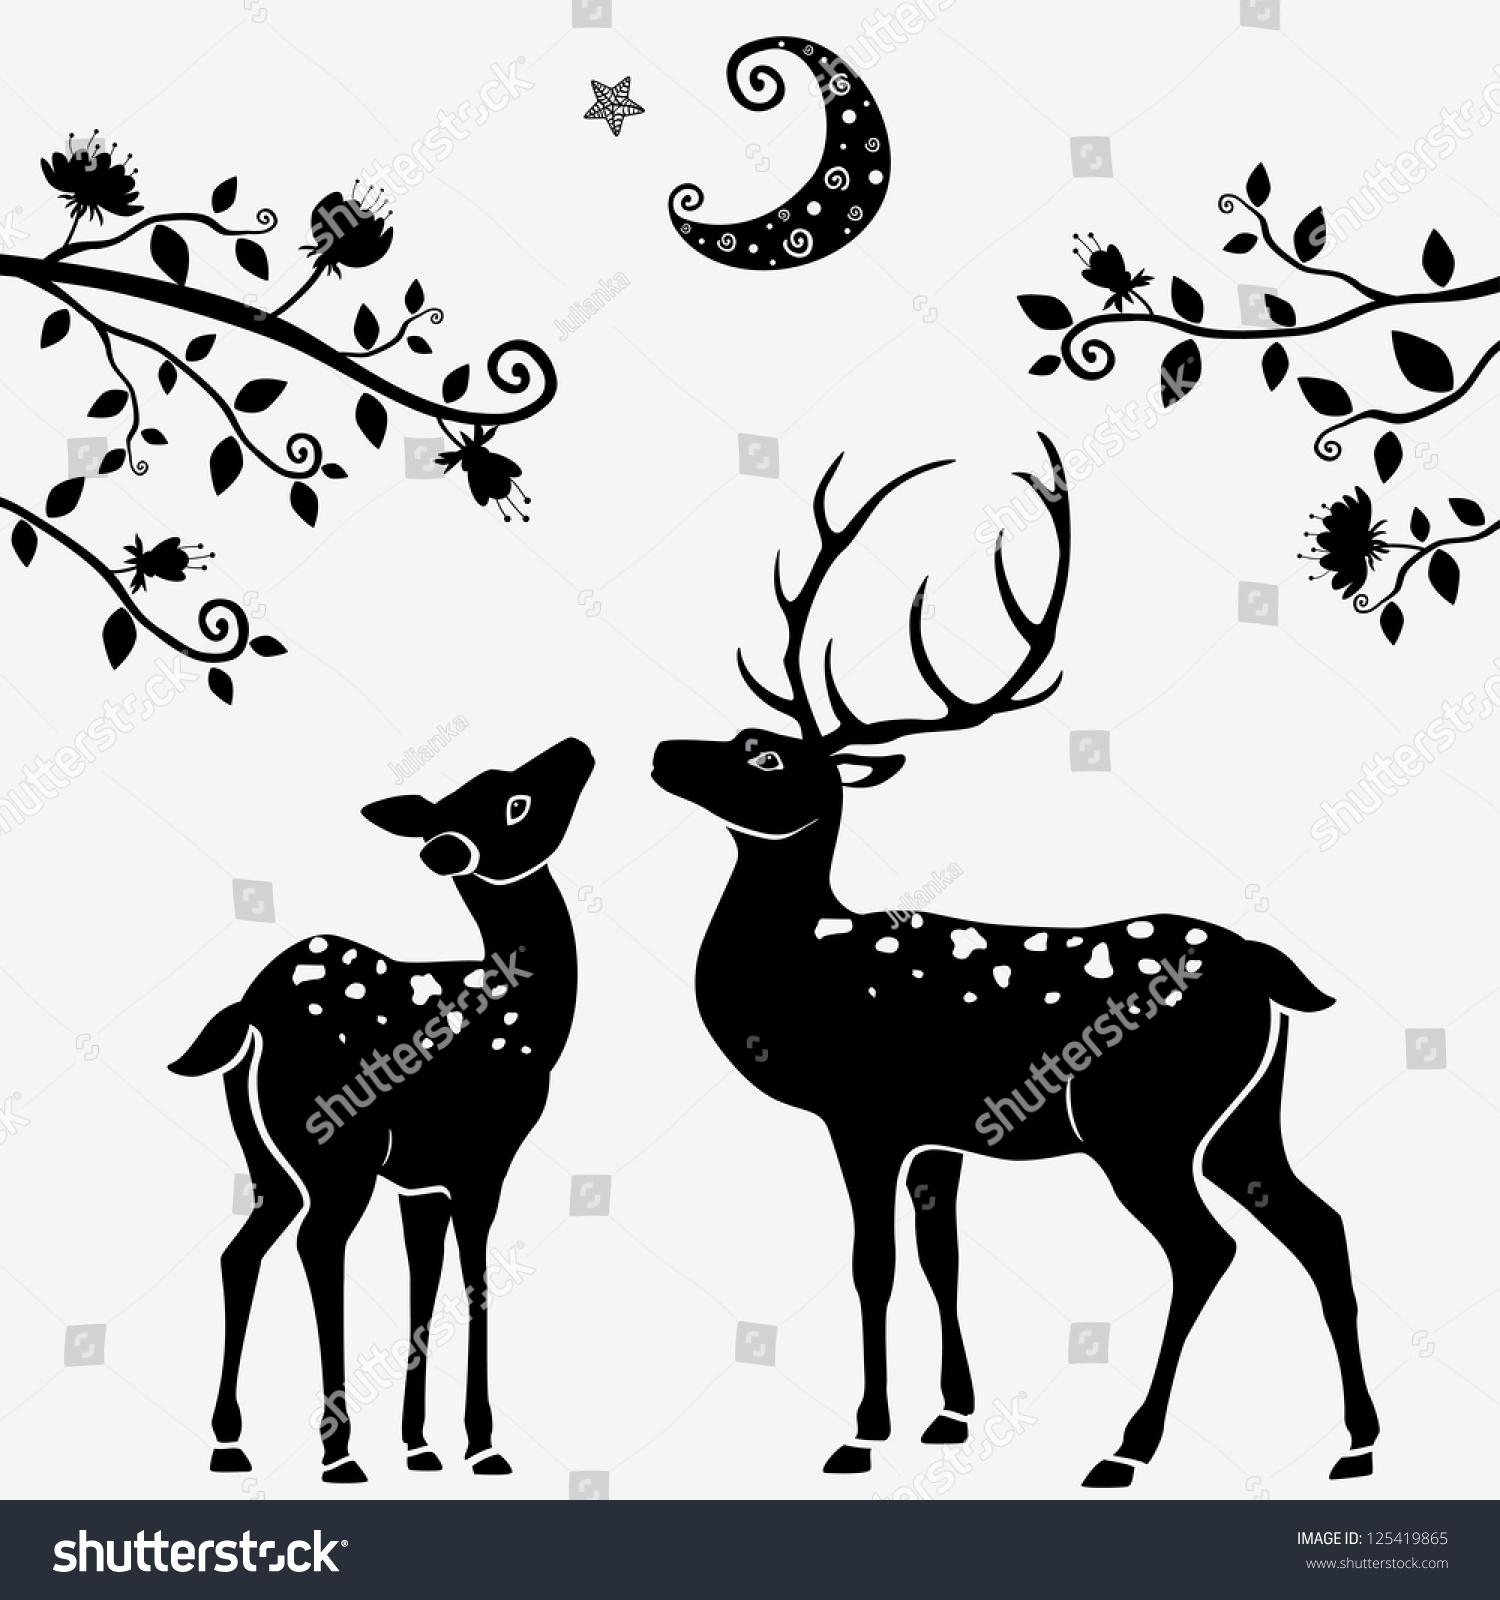 Deer illustration black and white - photo#46